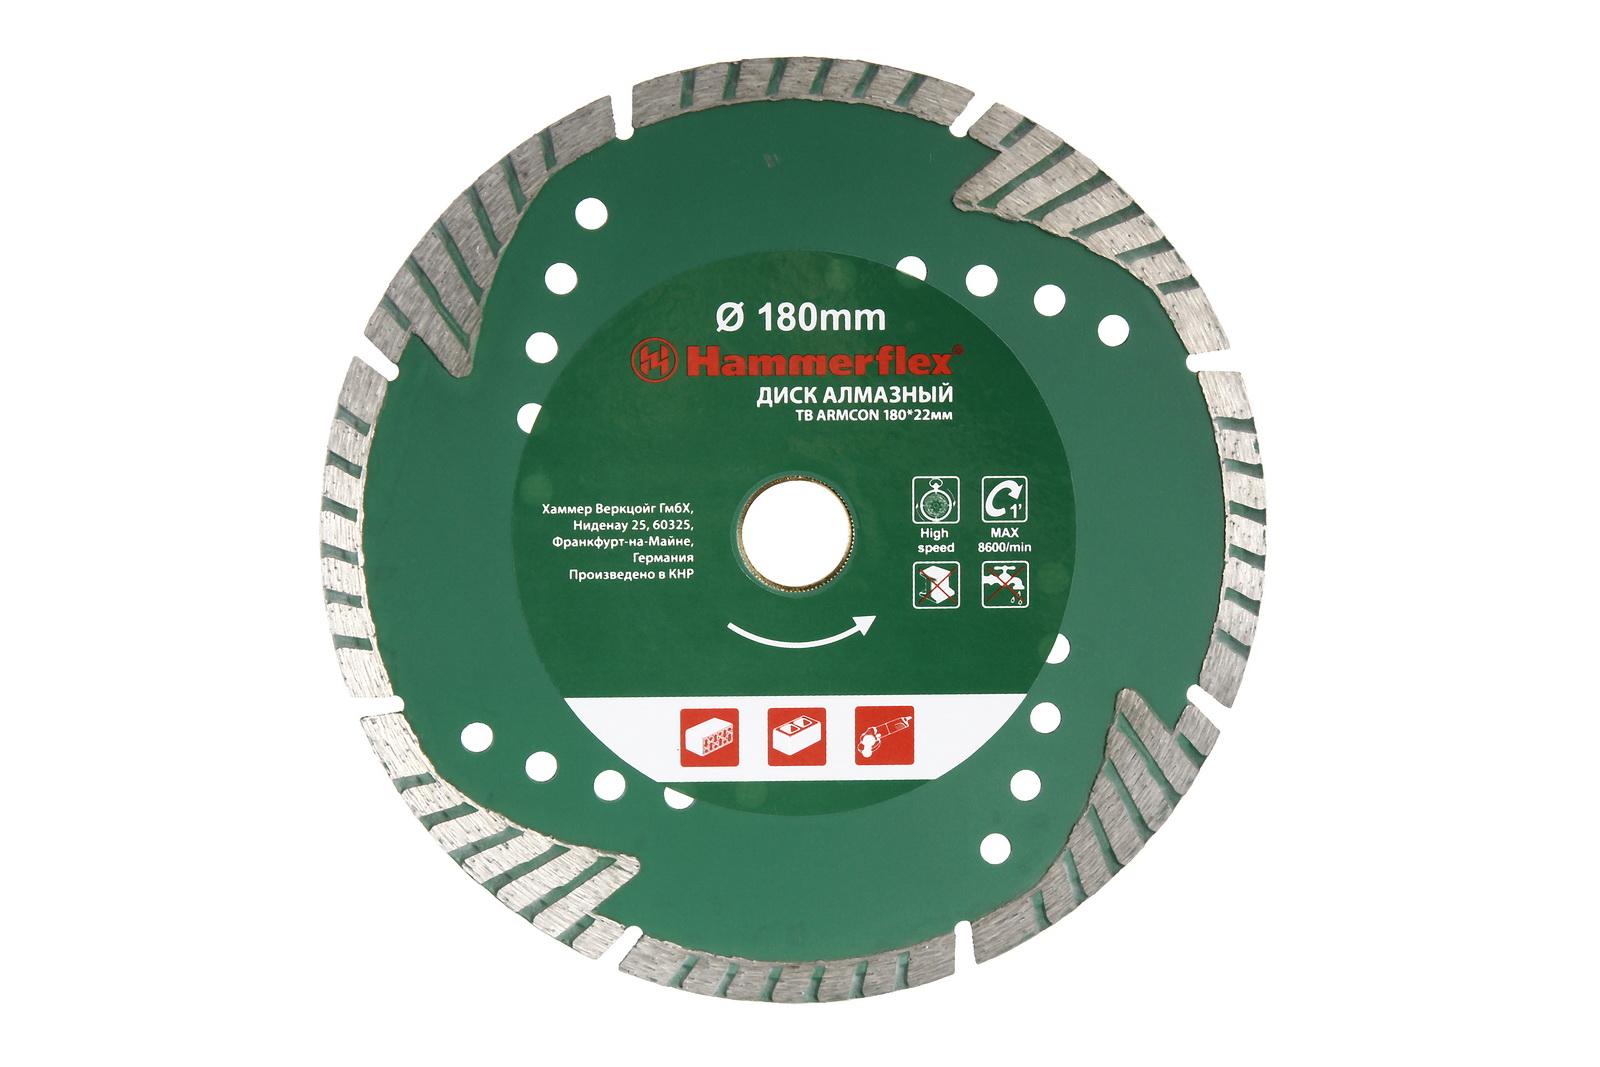 Картинка для Круг алмазный Hammer 206-124 db tb armcon